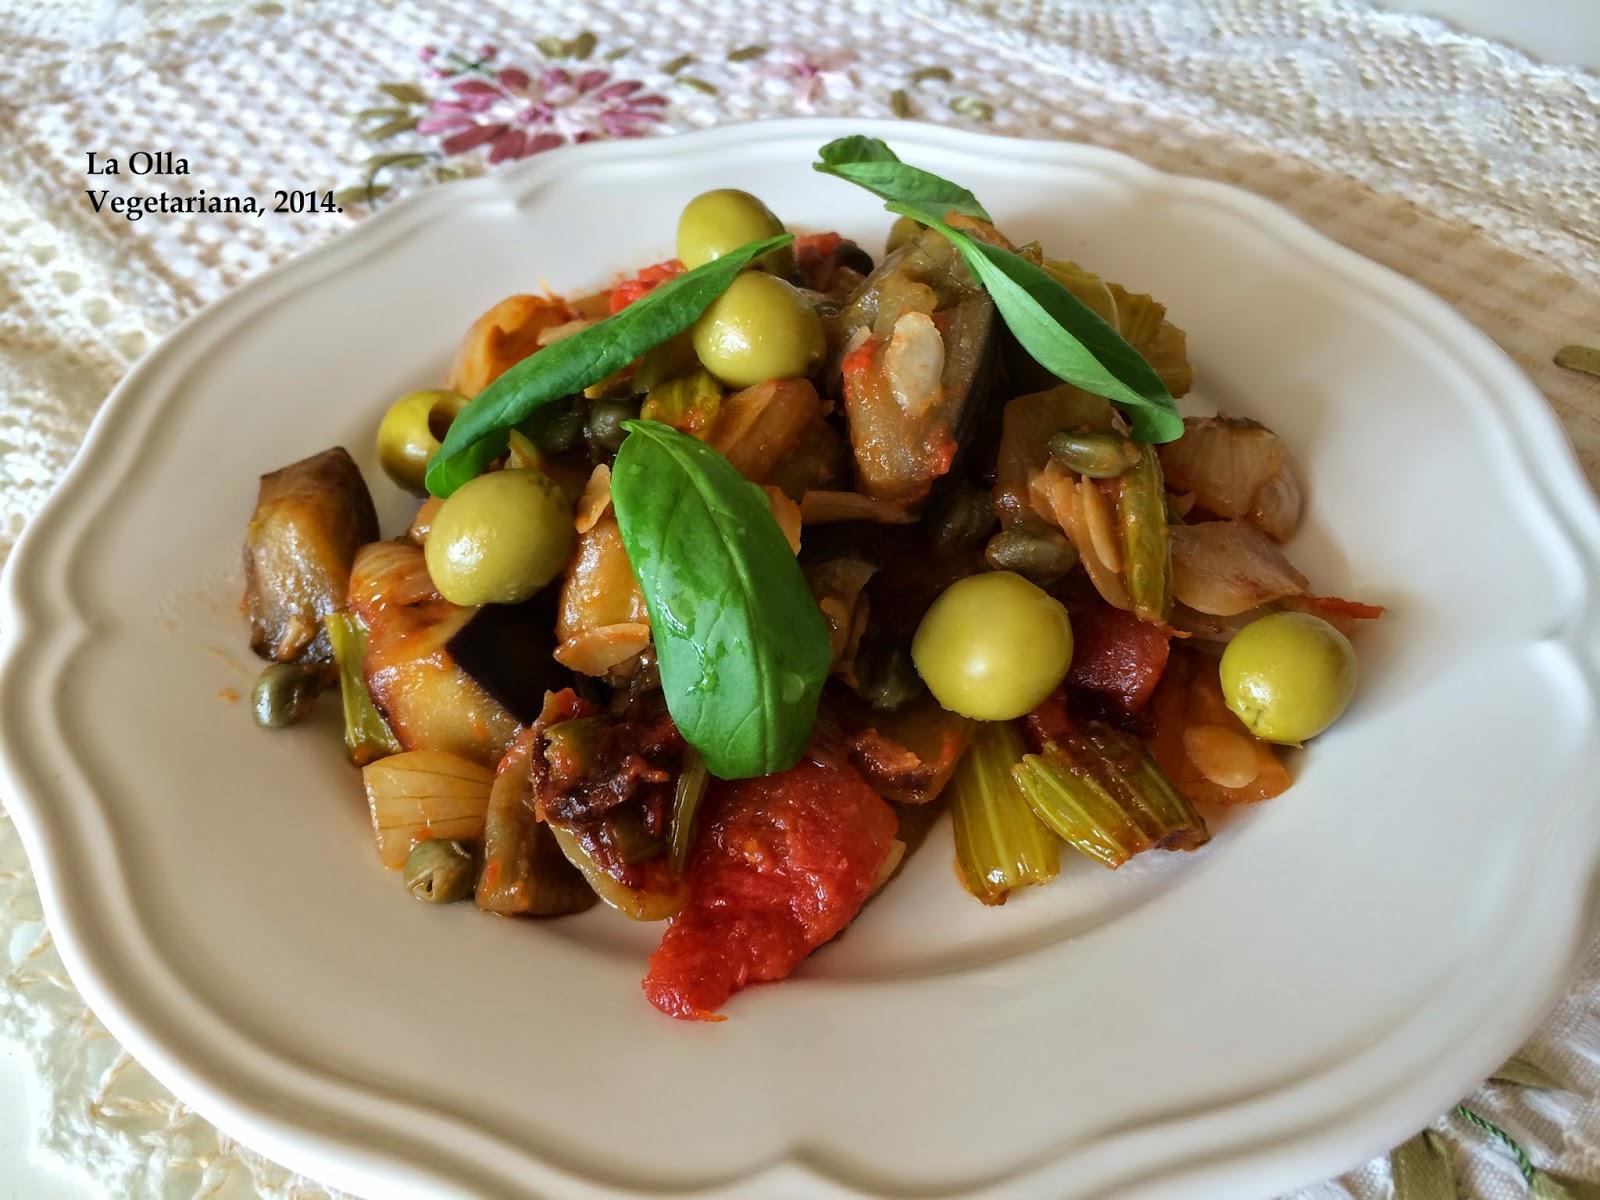 La olla vegetariana caponata aut ntica cocina for Cocina mediterranea